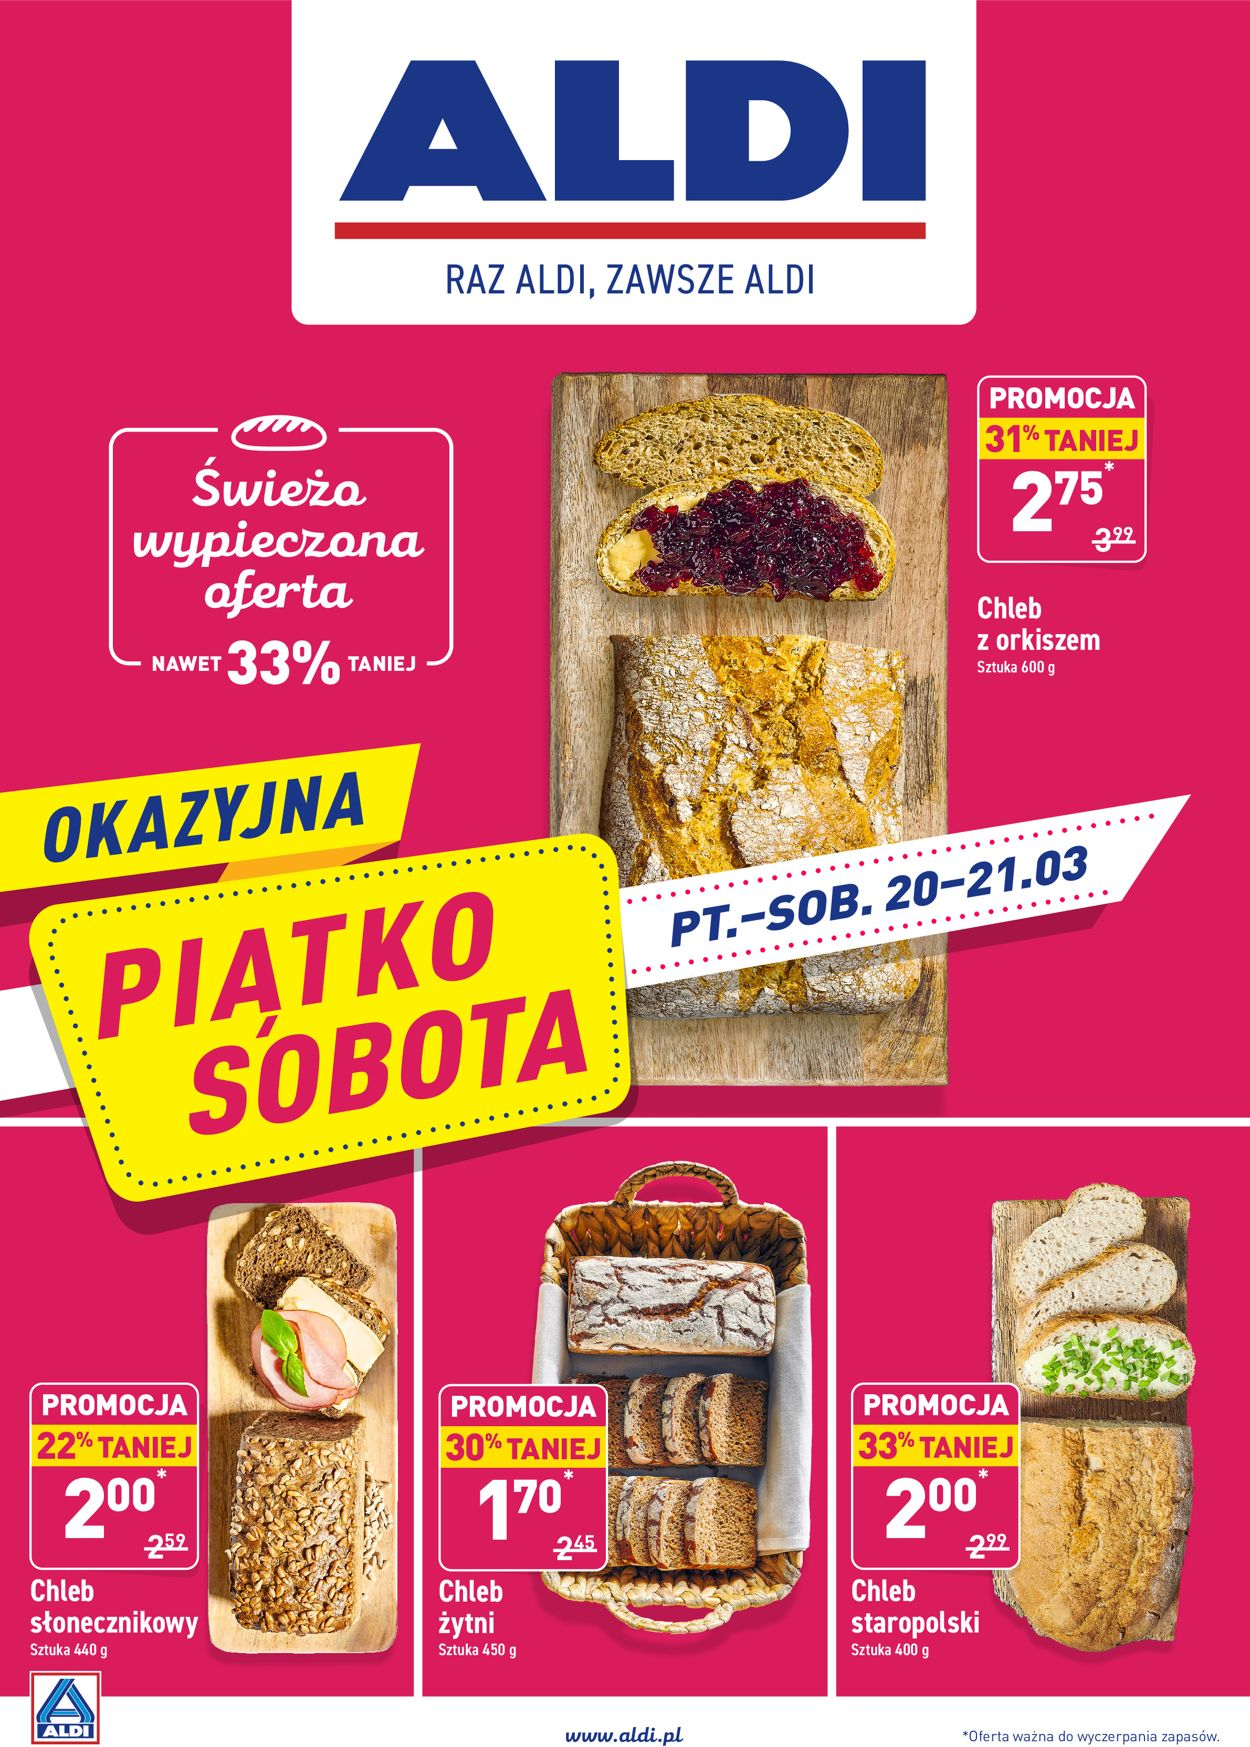 Gazetka promocyjna ALDI - 20.03-21.03.2020